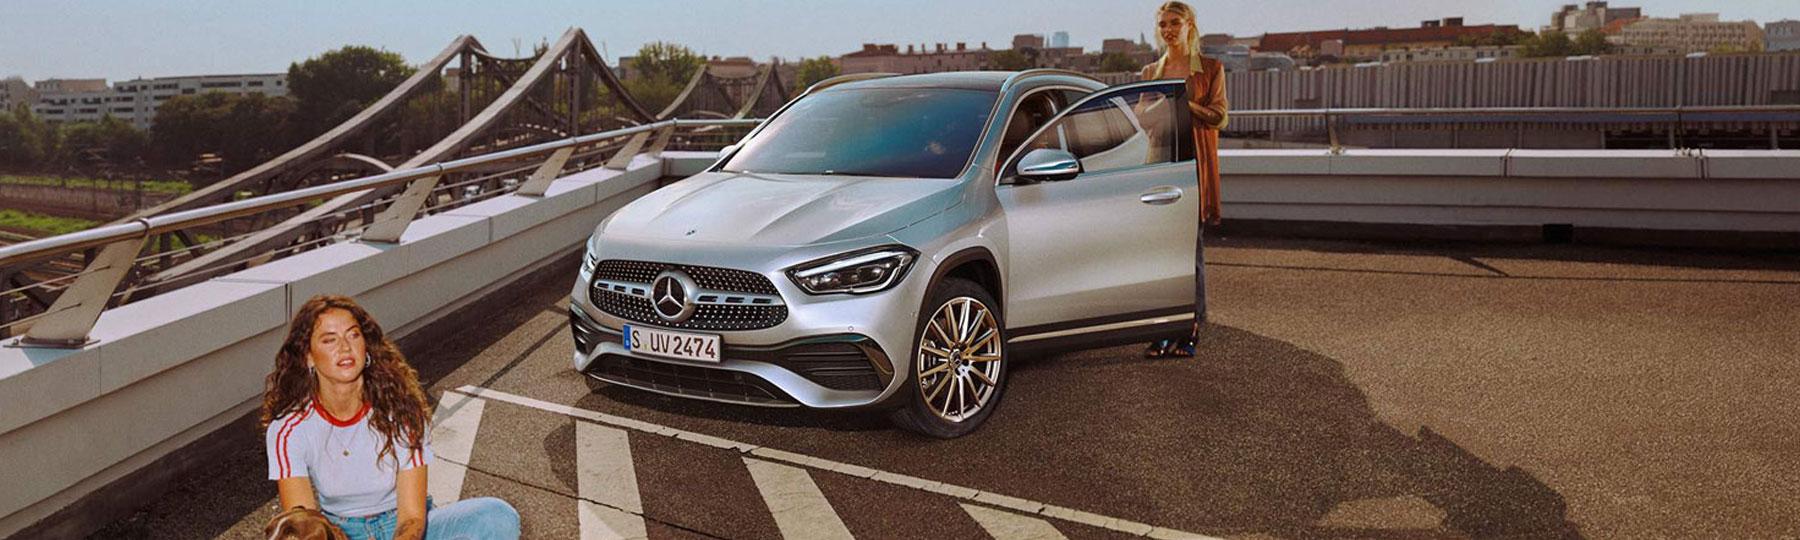 mercedes benz GLA New Car Offer